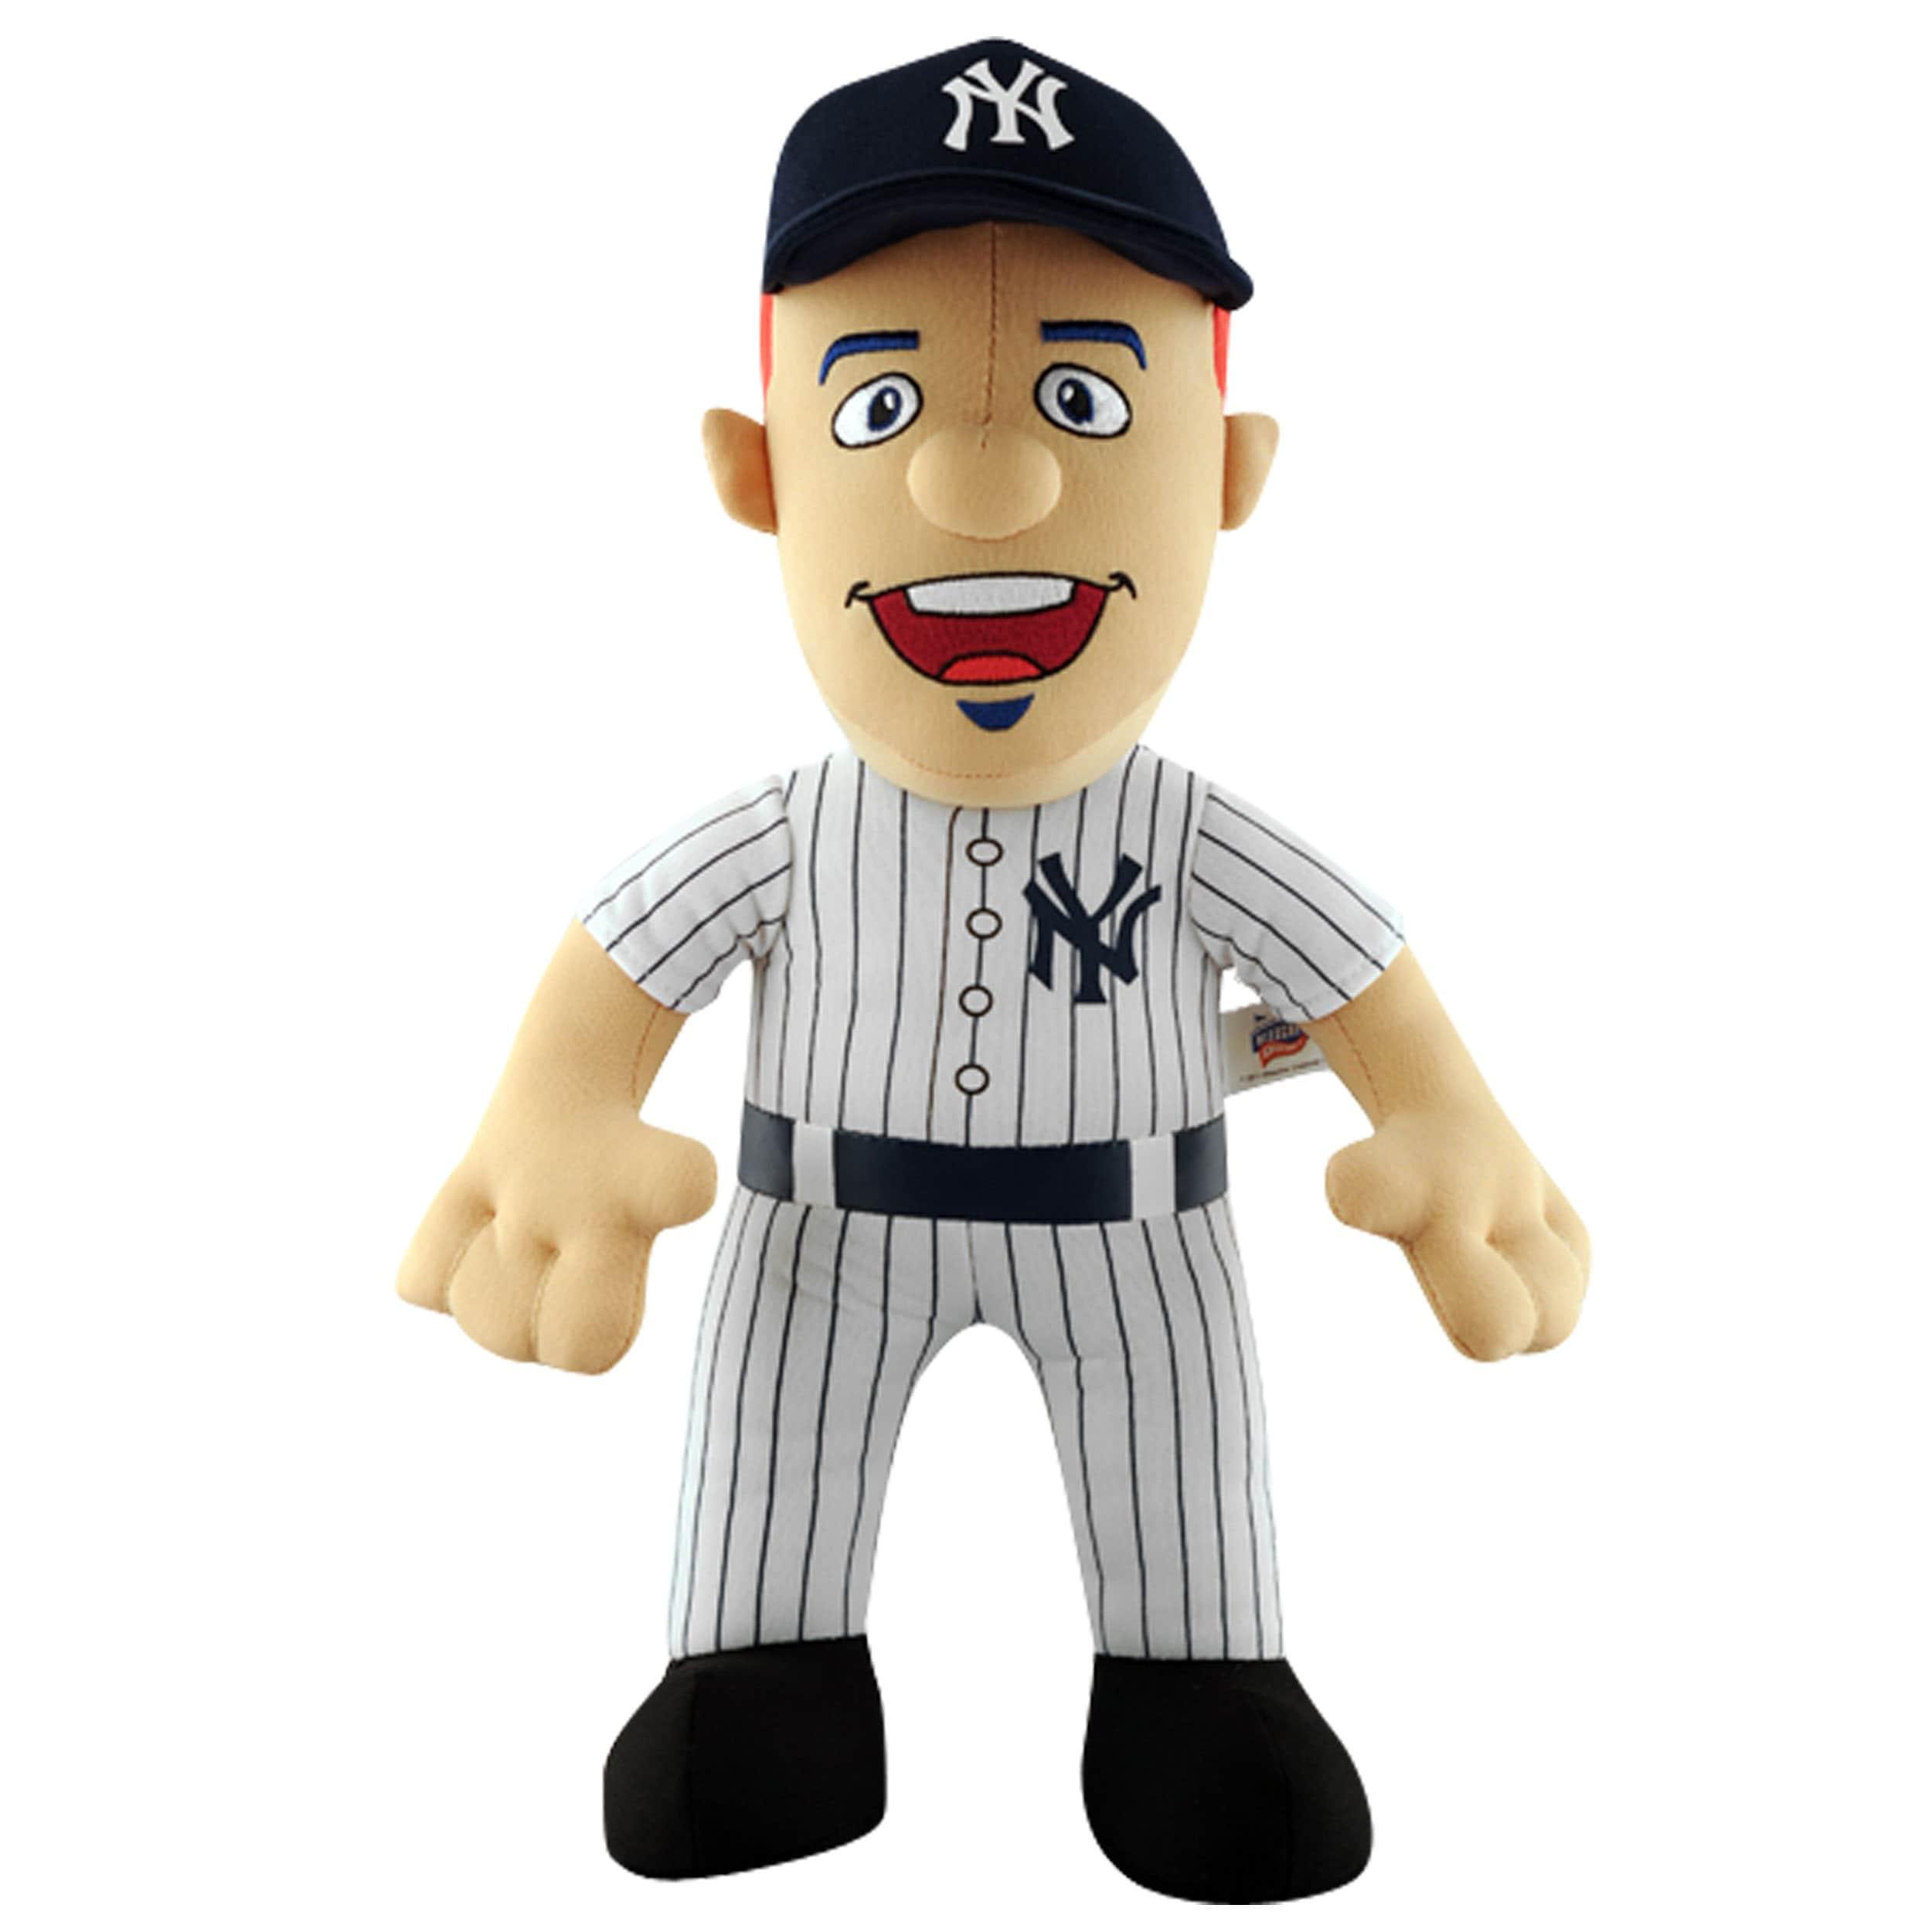 Bleacher Creatures New York Yankees 14-inch Sporto Plush Doll